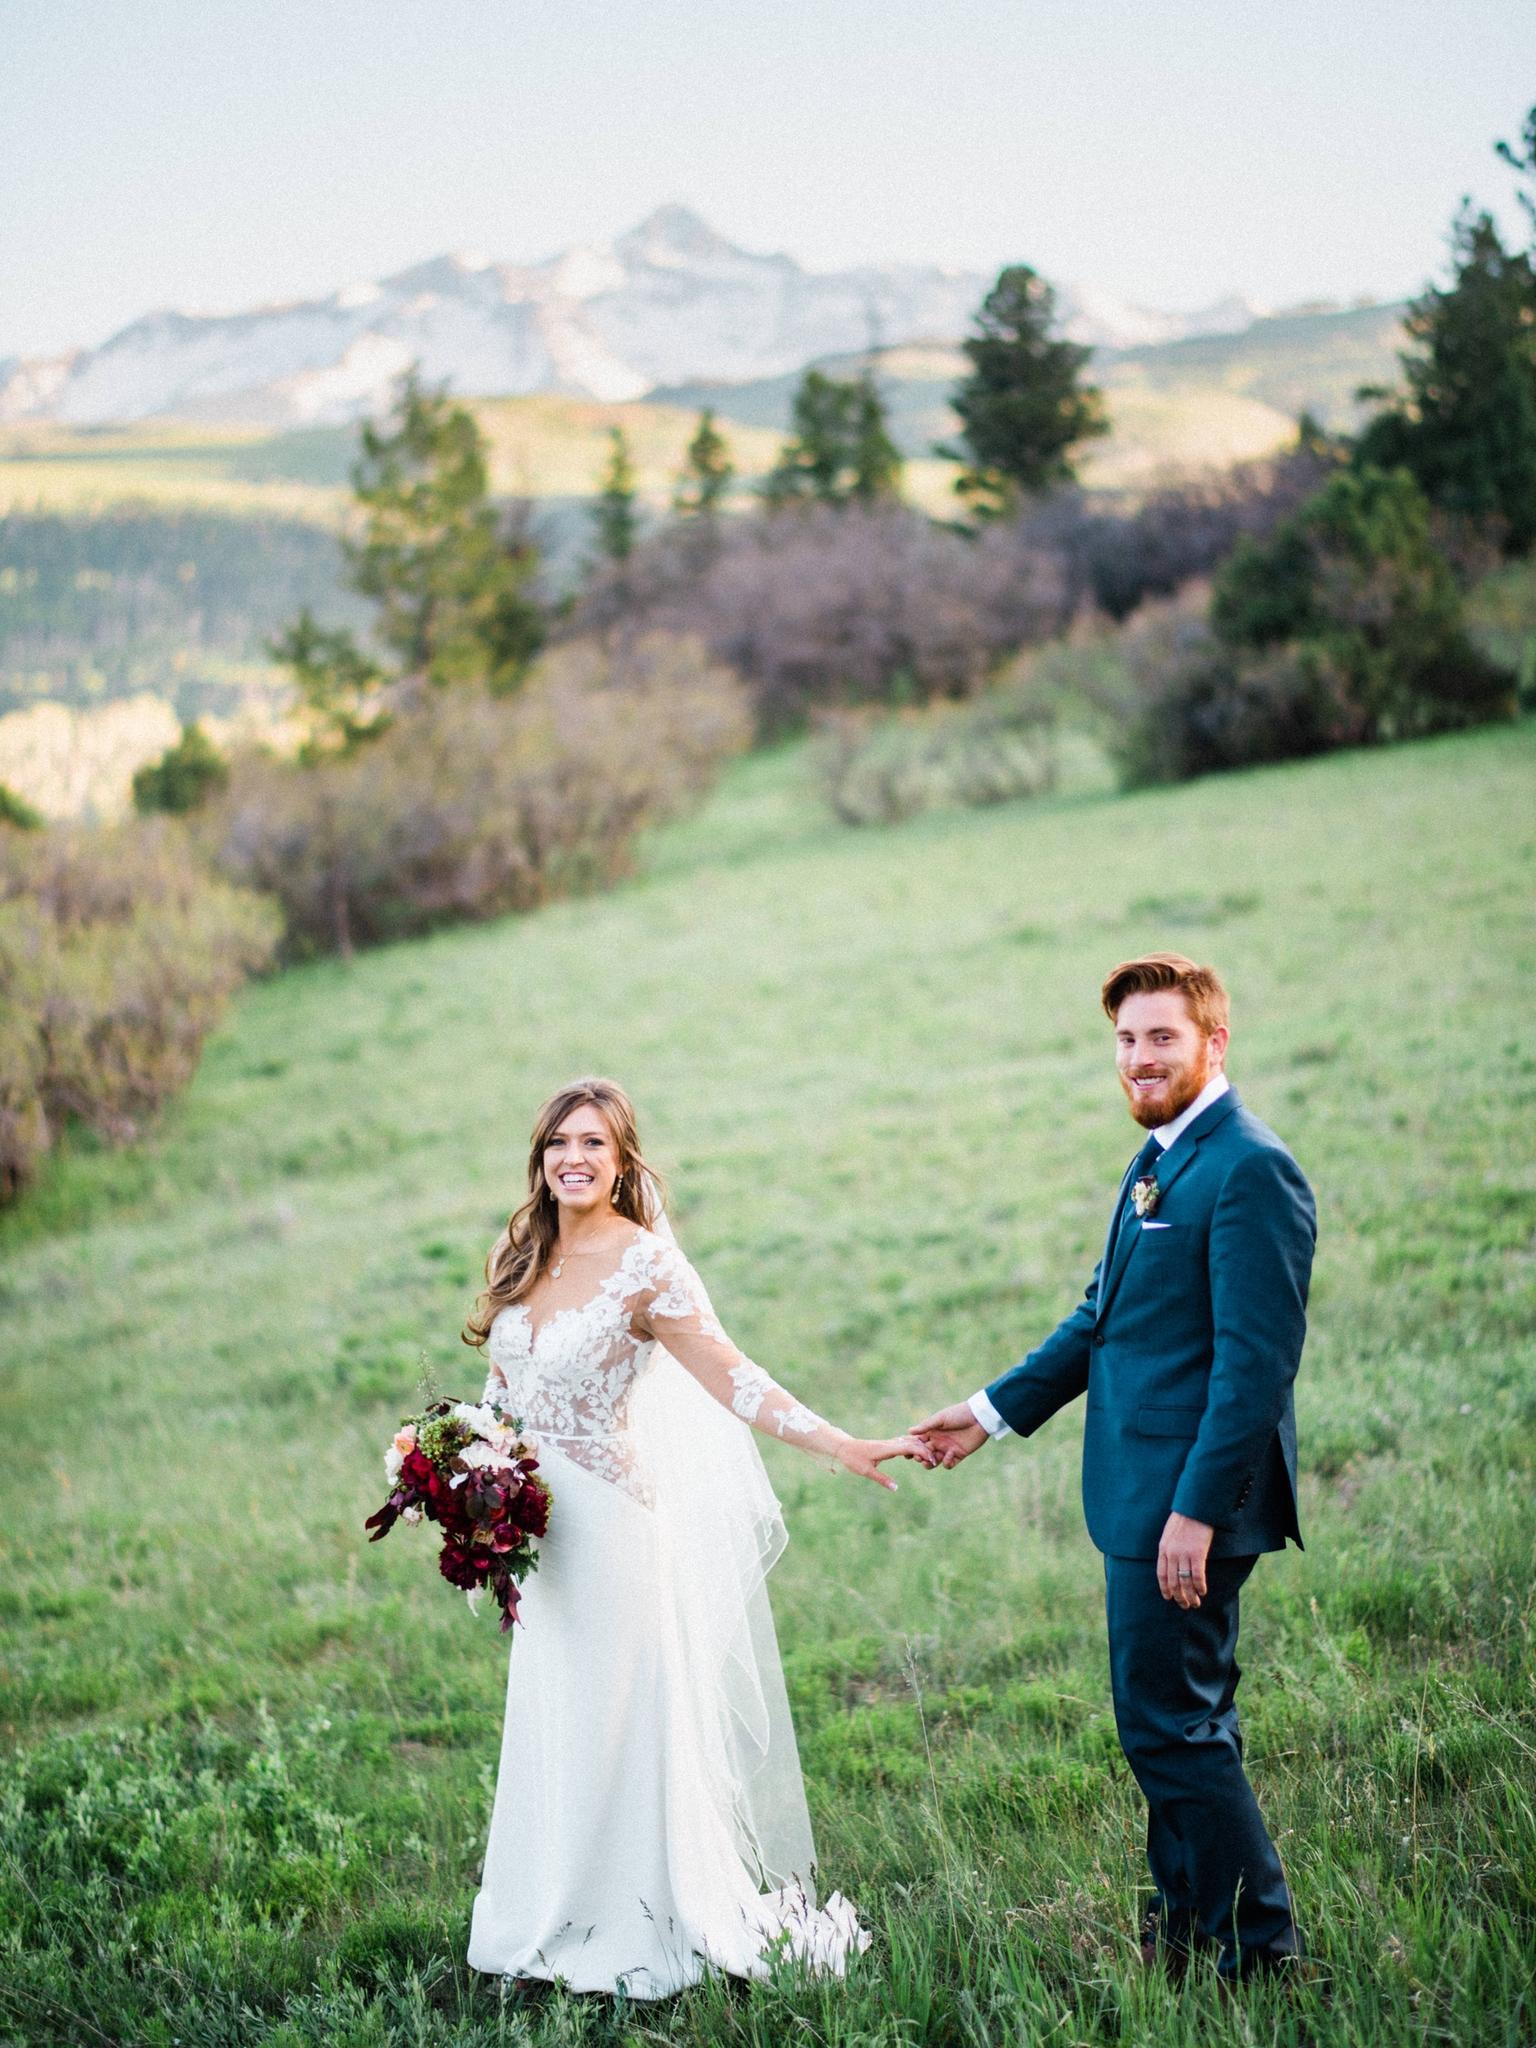 Outdoor Telluride Wedding Bride and Groom in grassy field